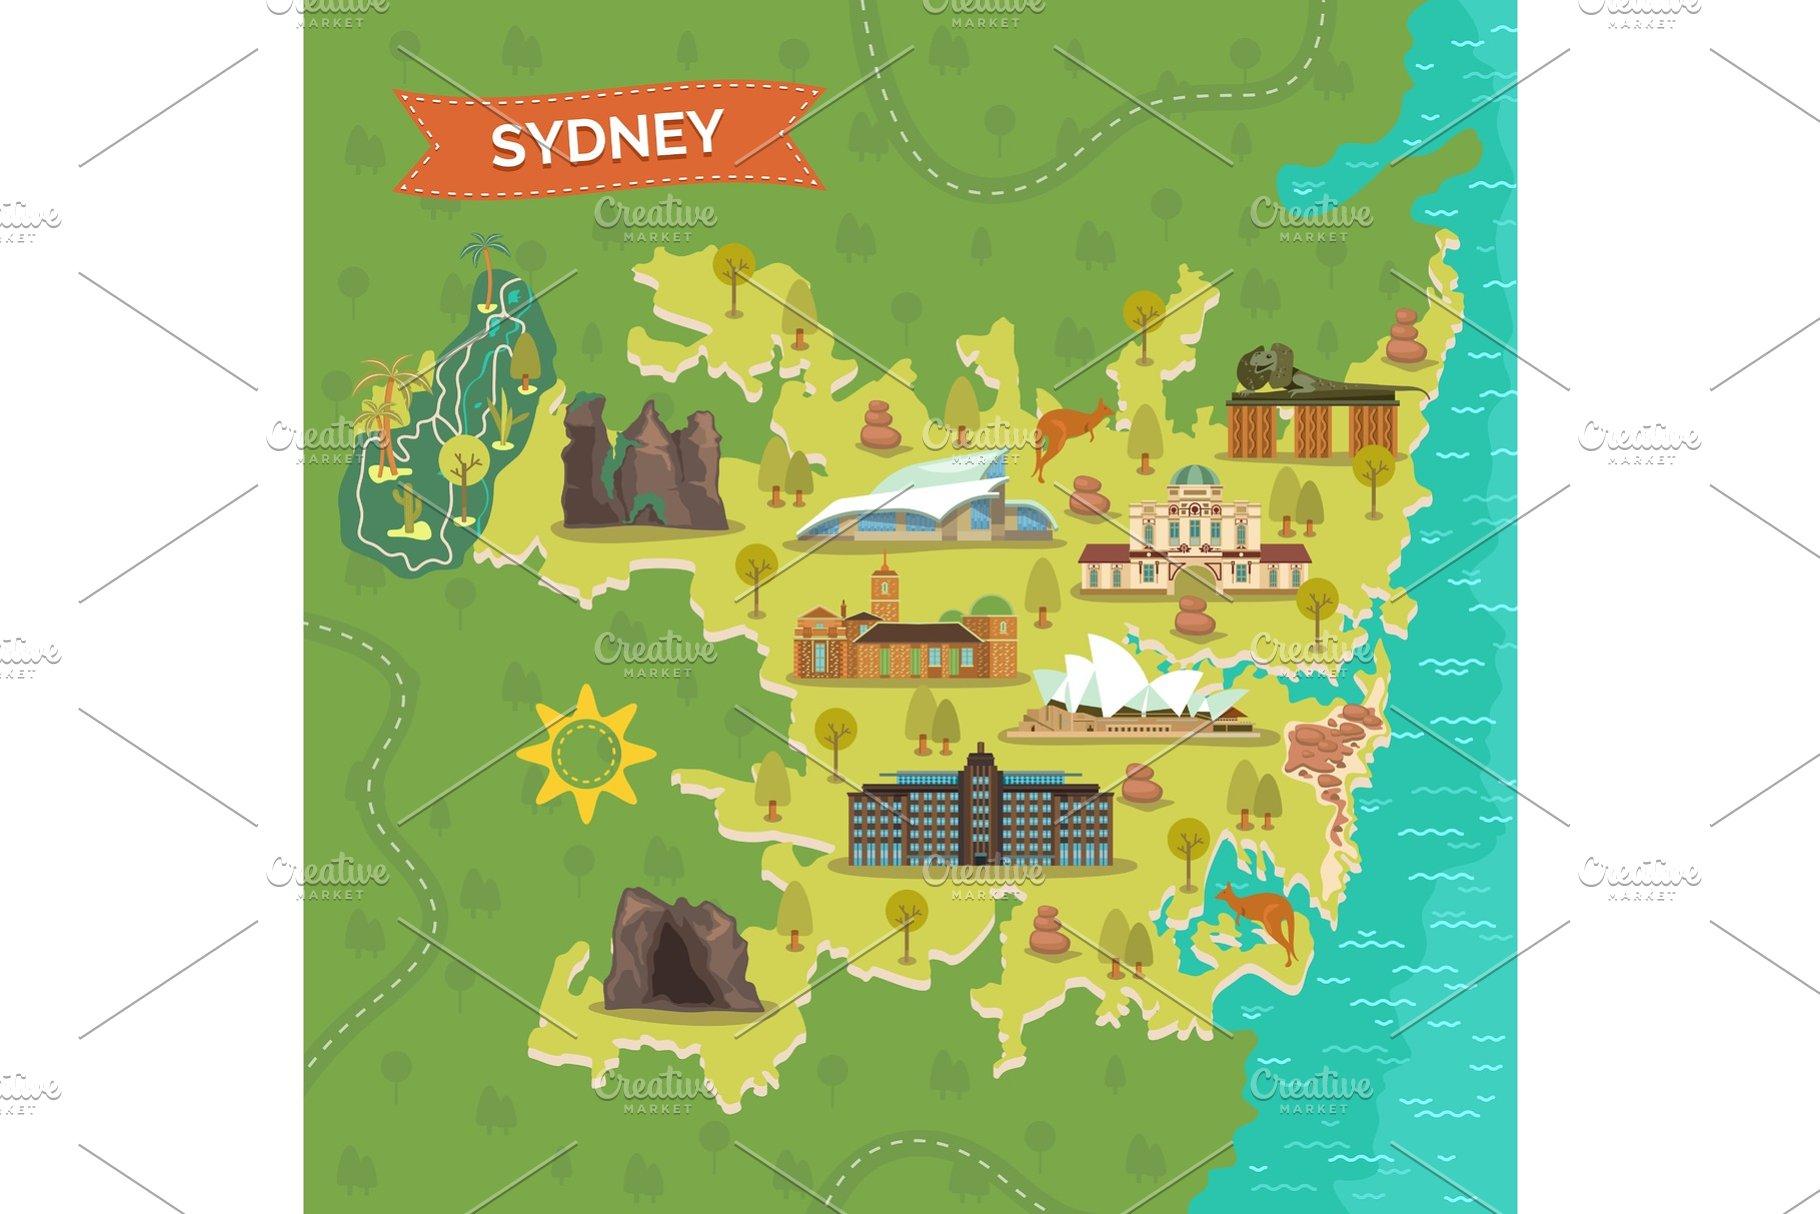 Map Of Australia Landmarks.Map Of Sydney With Landmarks